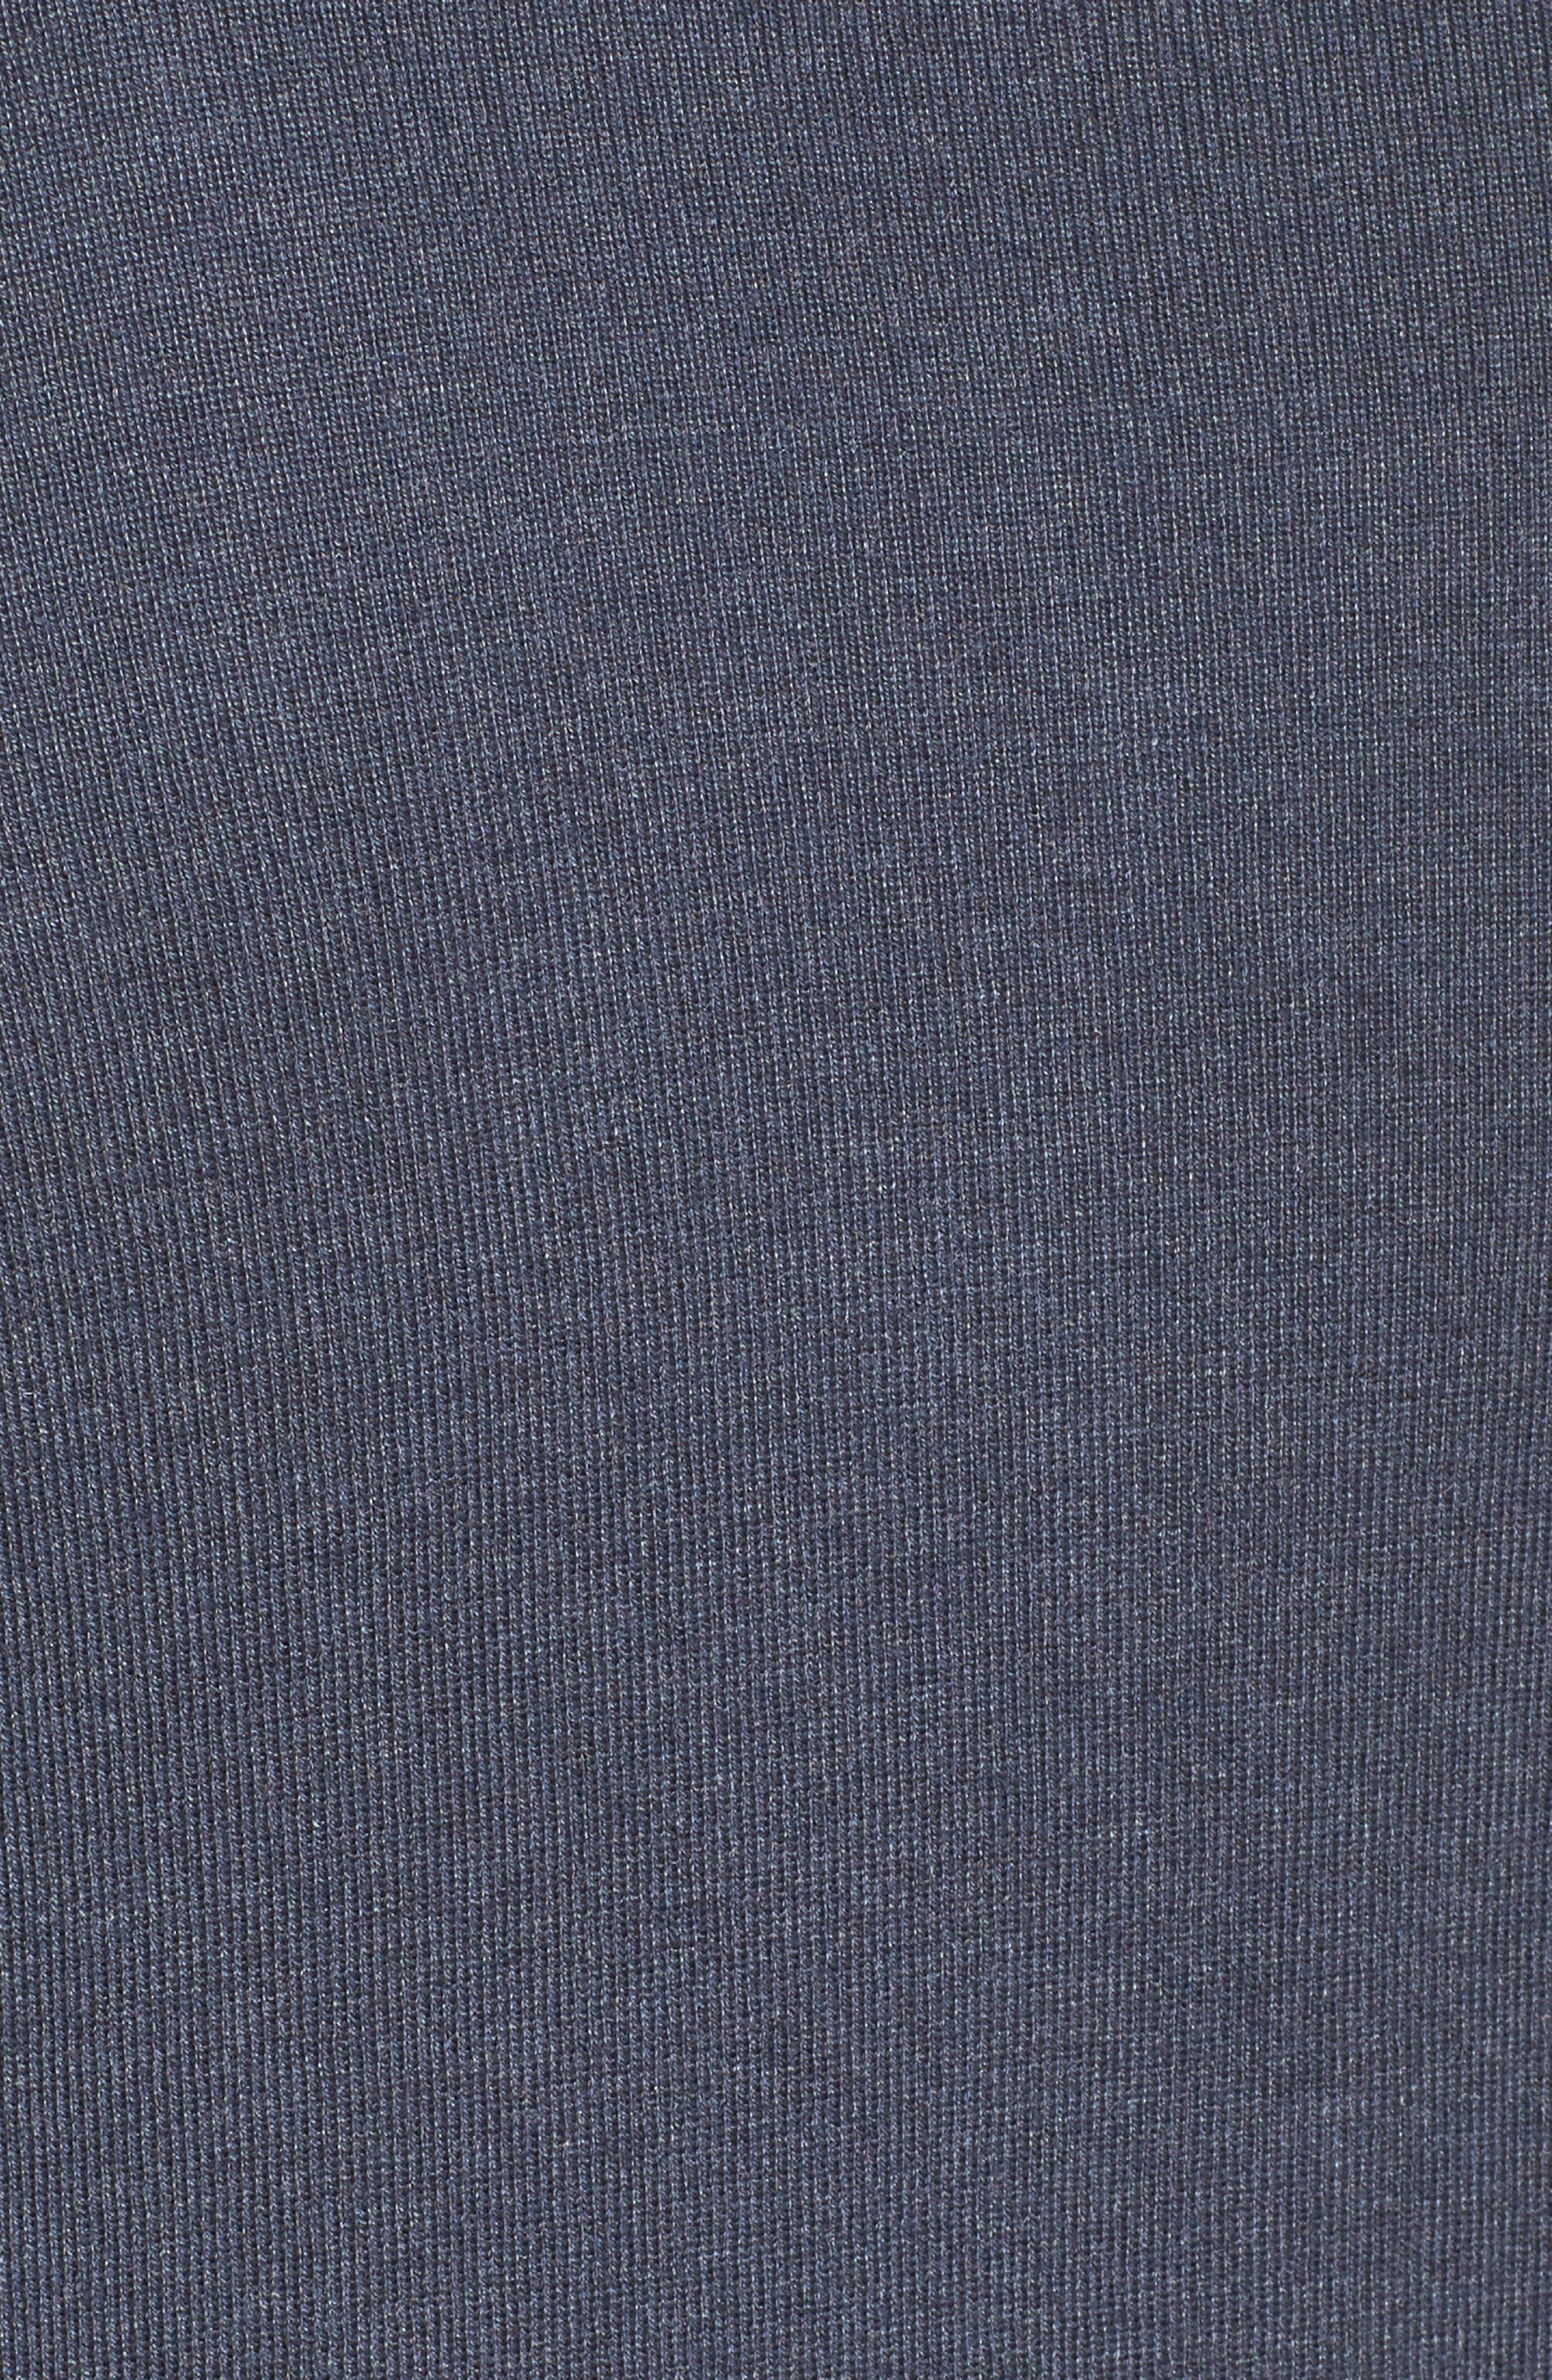 4-Way Convertible Cardigan,                             Alternate thumbnail 5, color,                             SLATE